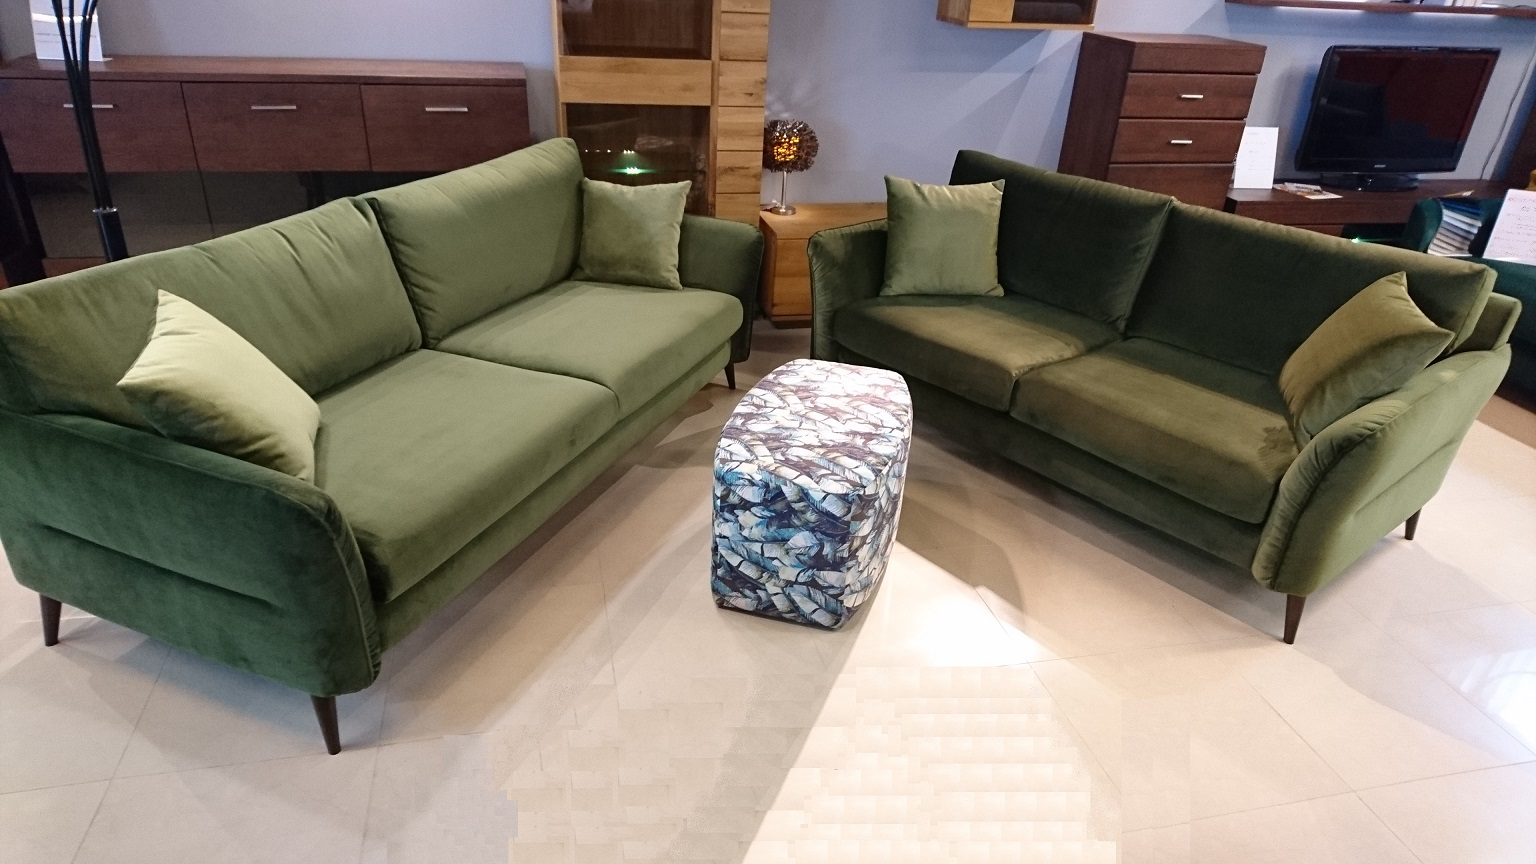 NORTON EMMOHL Warszawa Meble STUDIO KOMFORT sofa 3 i sofa 2,5 tkanina welur zielony DOLCE 08